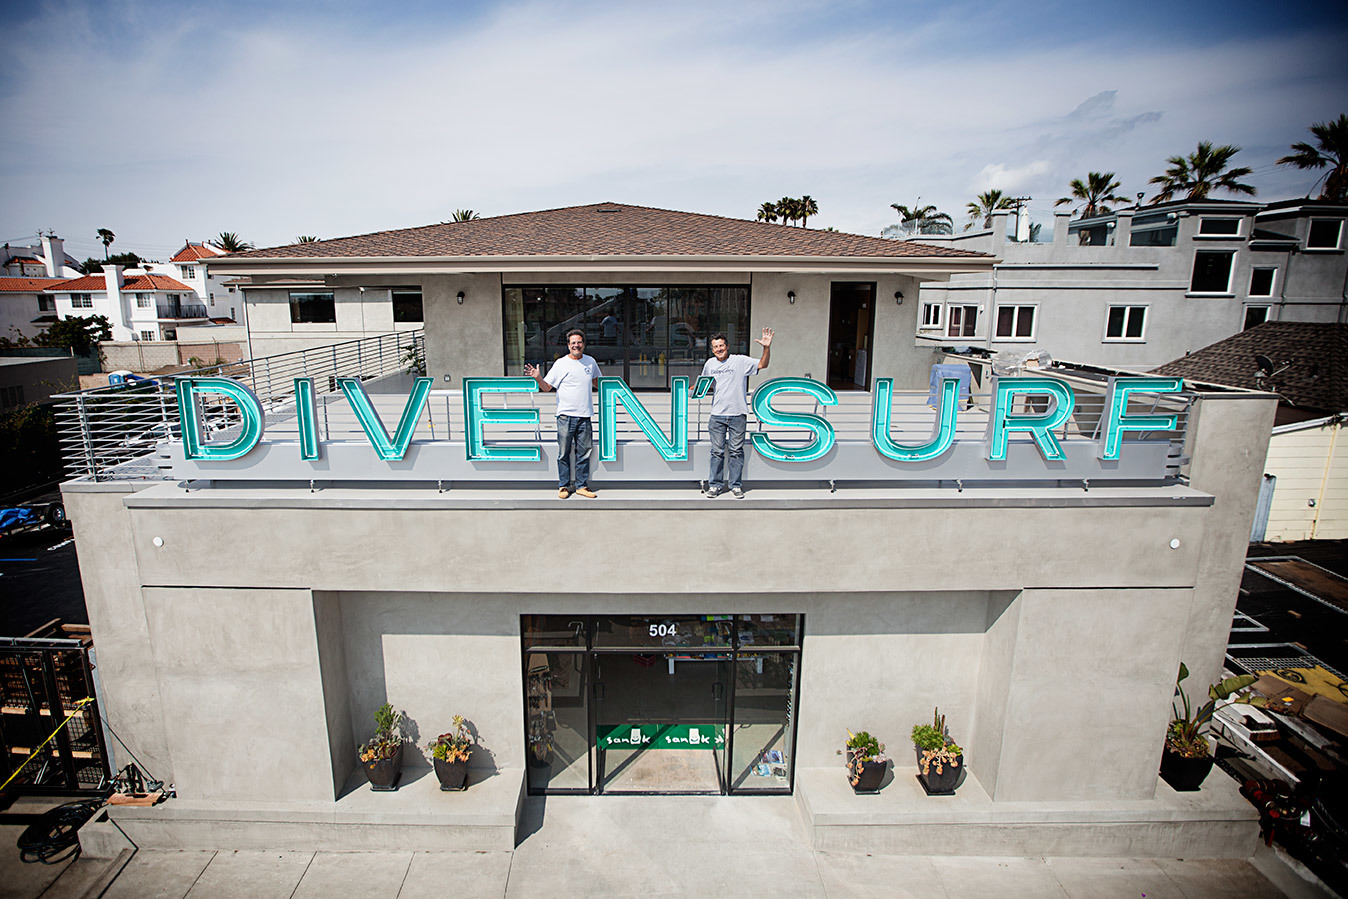 A Los Angeles surf shop guide